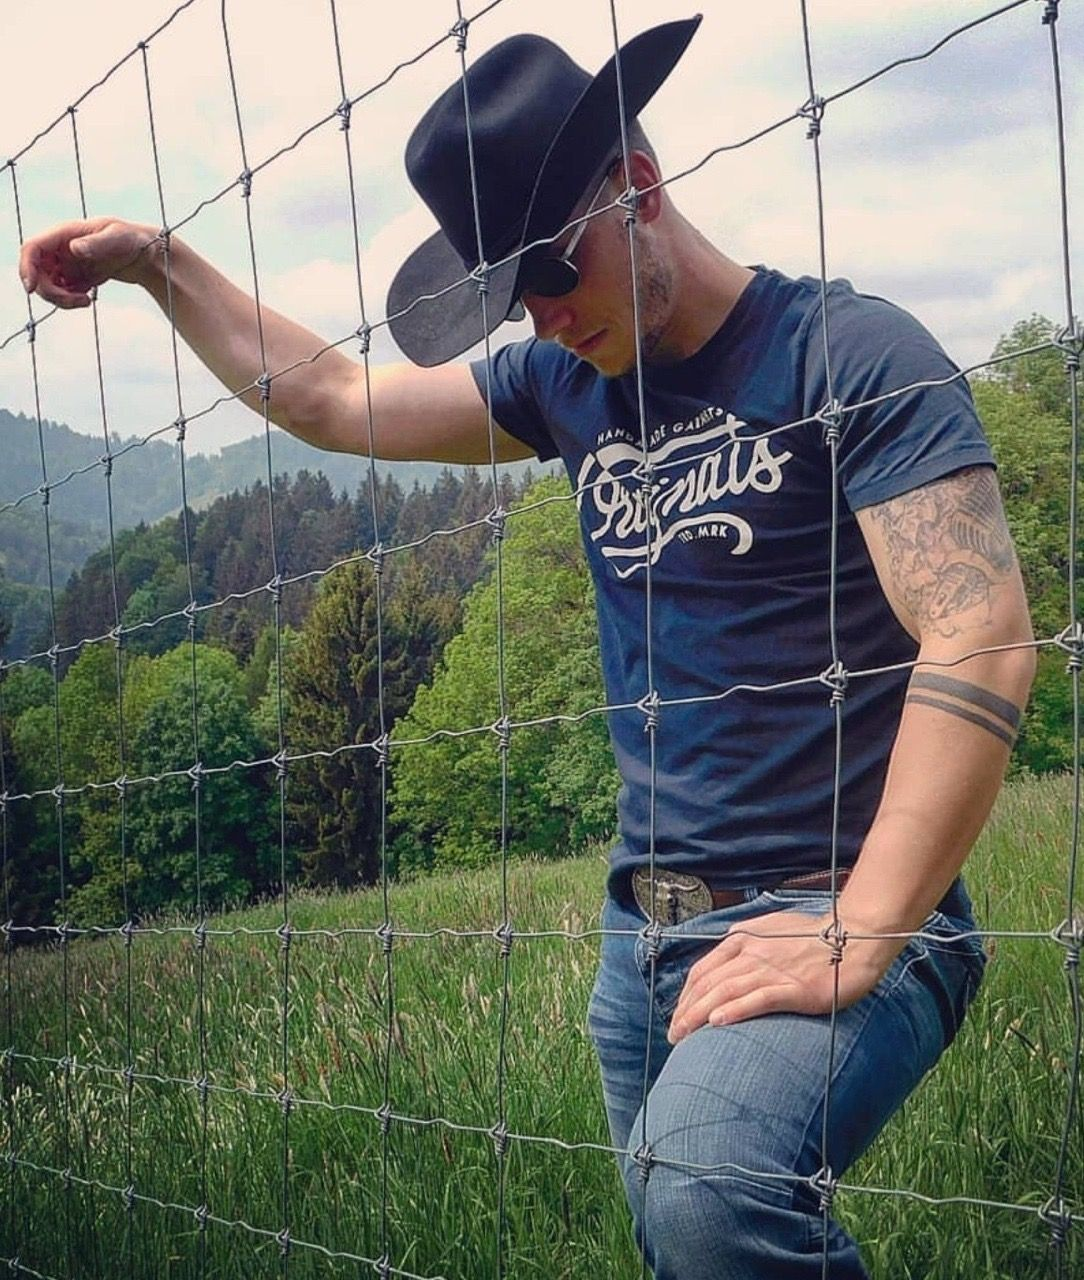 a1dc0b915 Pin by Milo on Cowboy hats | Cowboys men, Cowboy hats, Country men